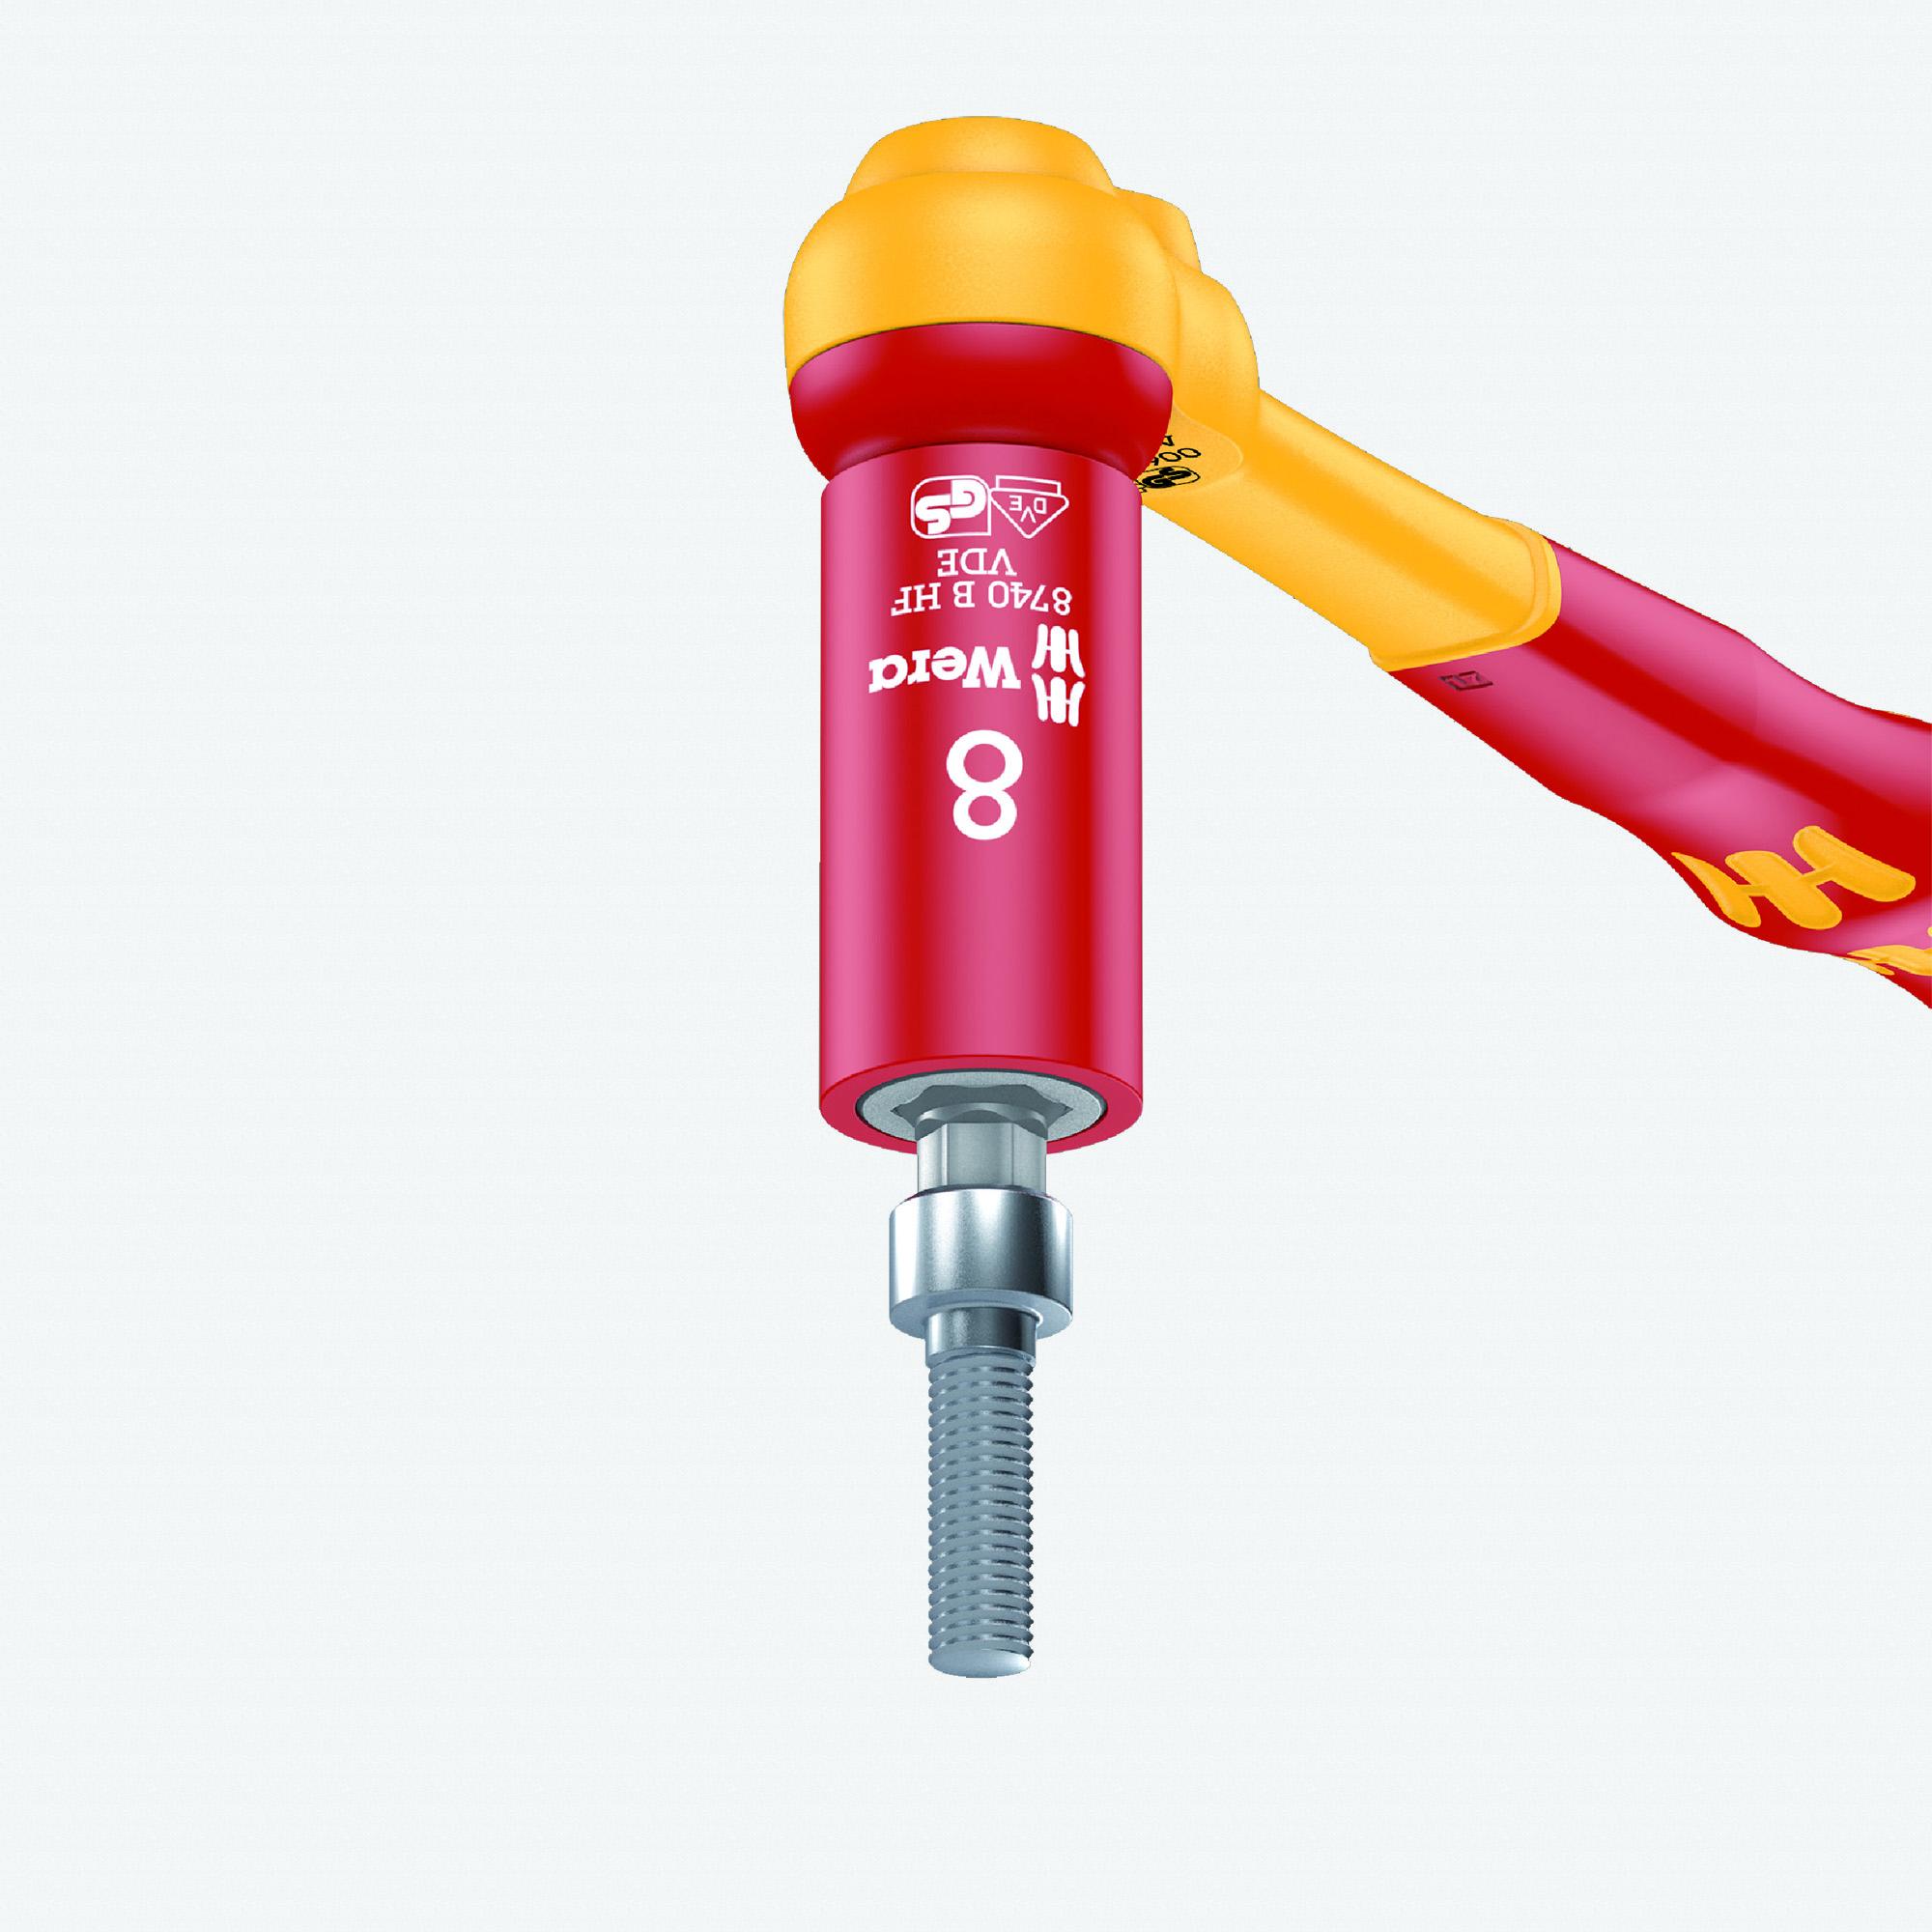 "Wera 004903 VDE HF Hex Bit 3/8"" Drive Socket, 8.0 mm - KC Tool"